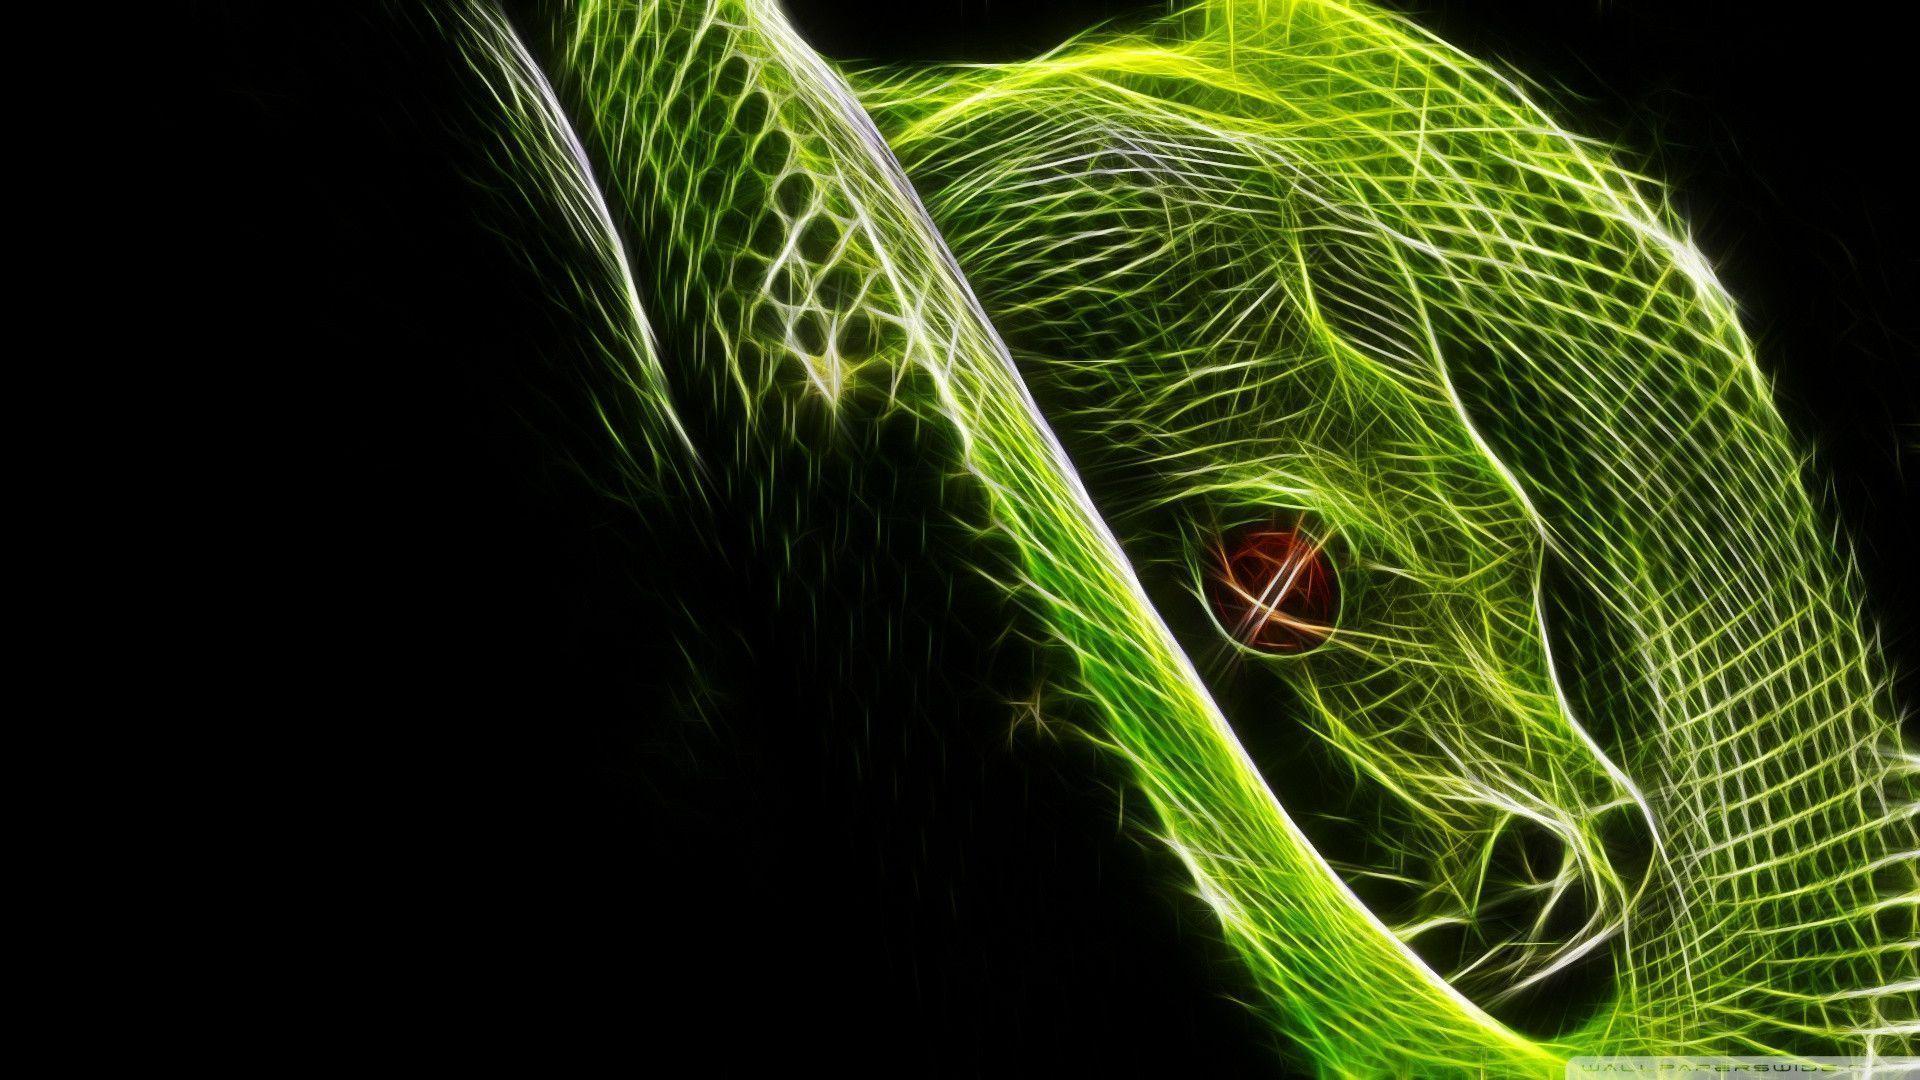 Snake HD Wallpapers- HD Wallpapers Inn